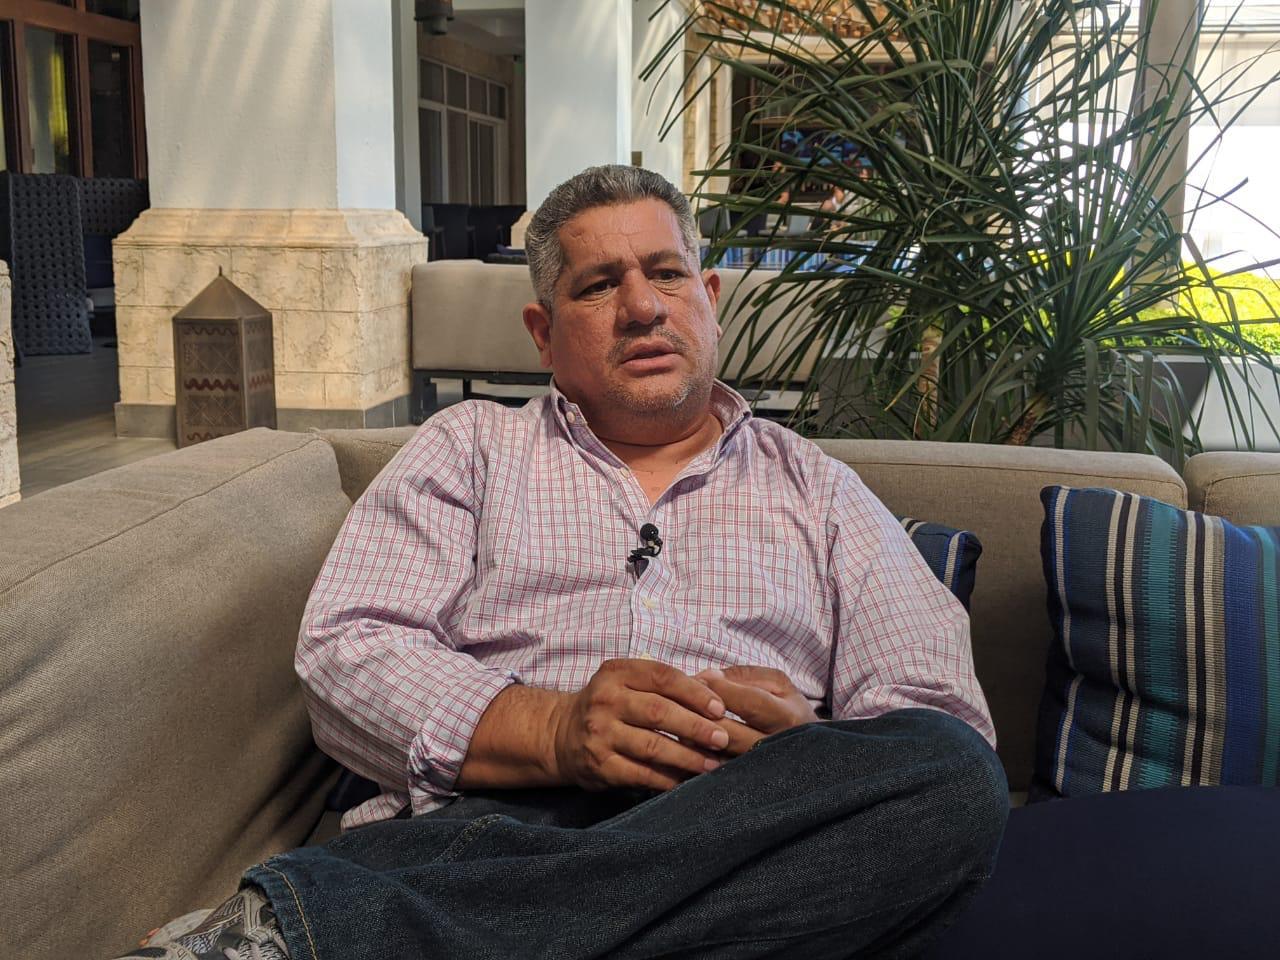 Emiliano Chamorro, periodista y director de Portavoz Ciudadano. Foto: Nicaragua Investiga